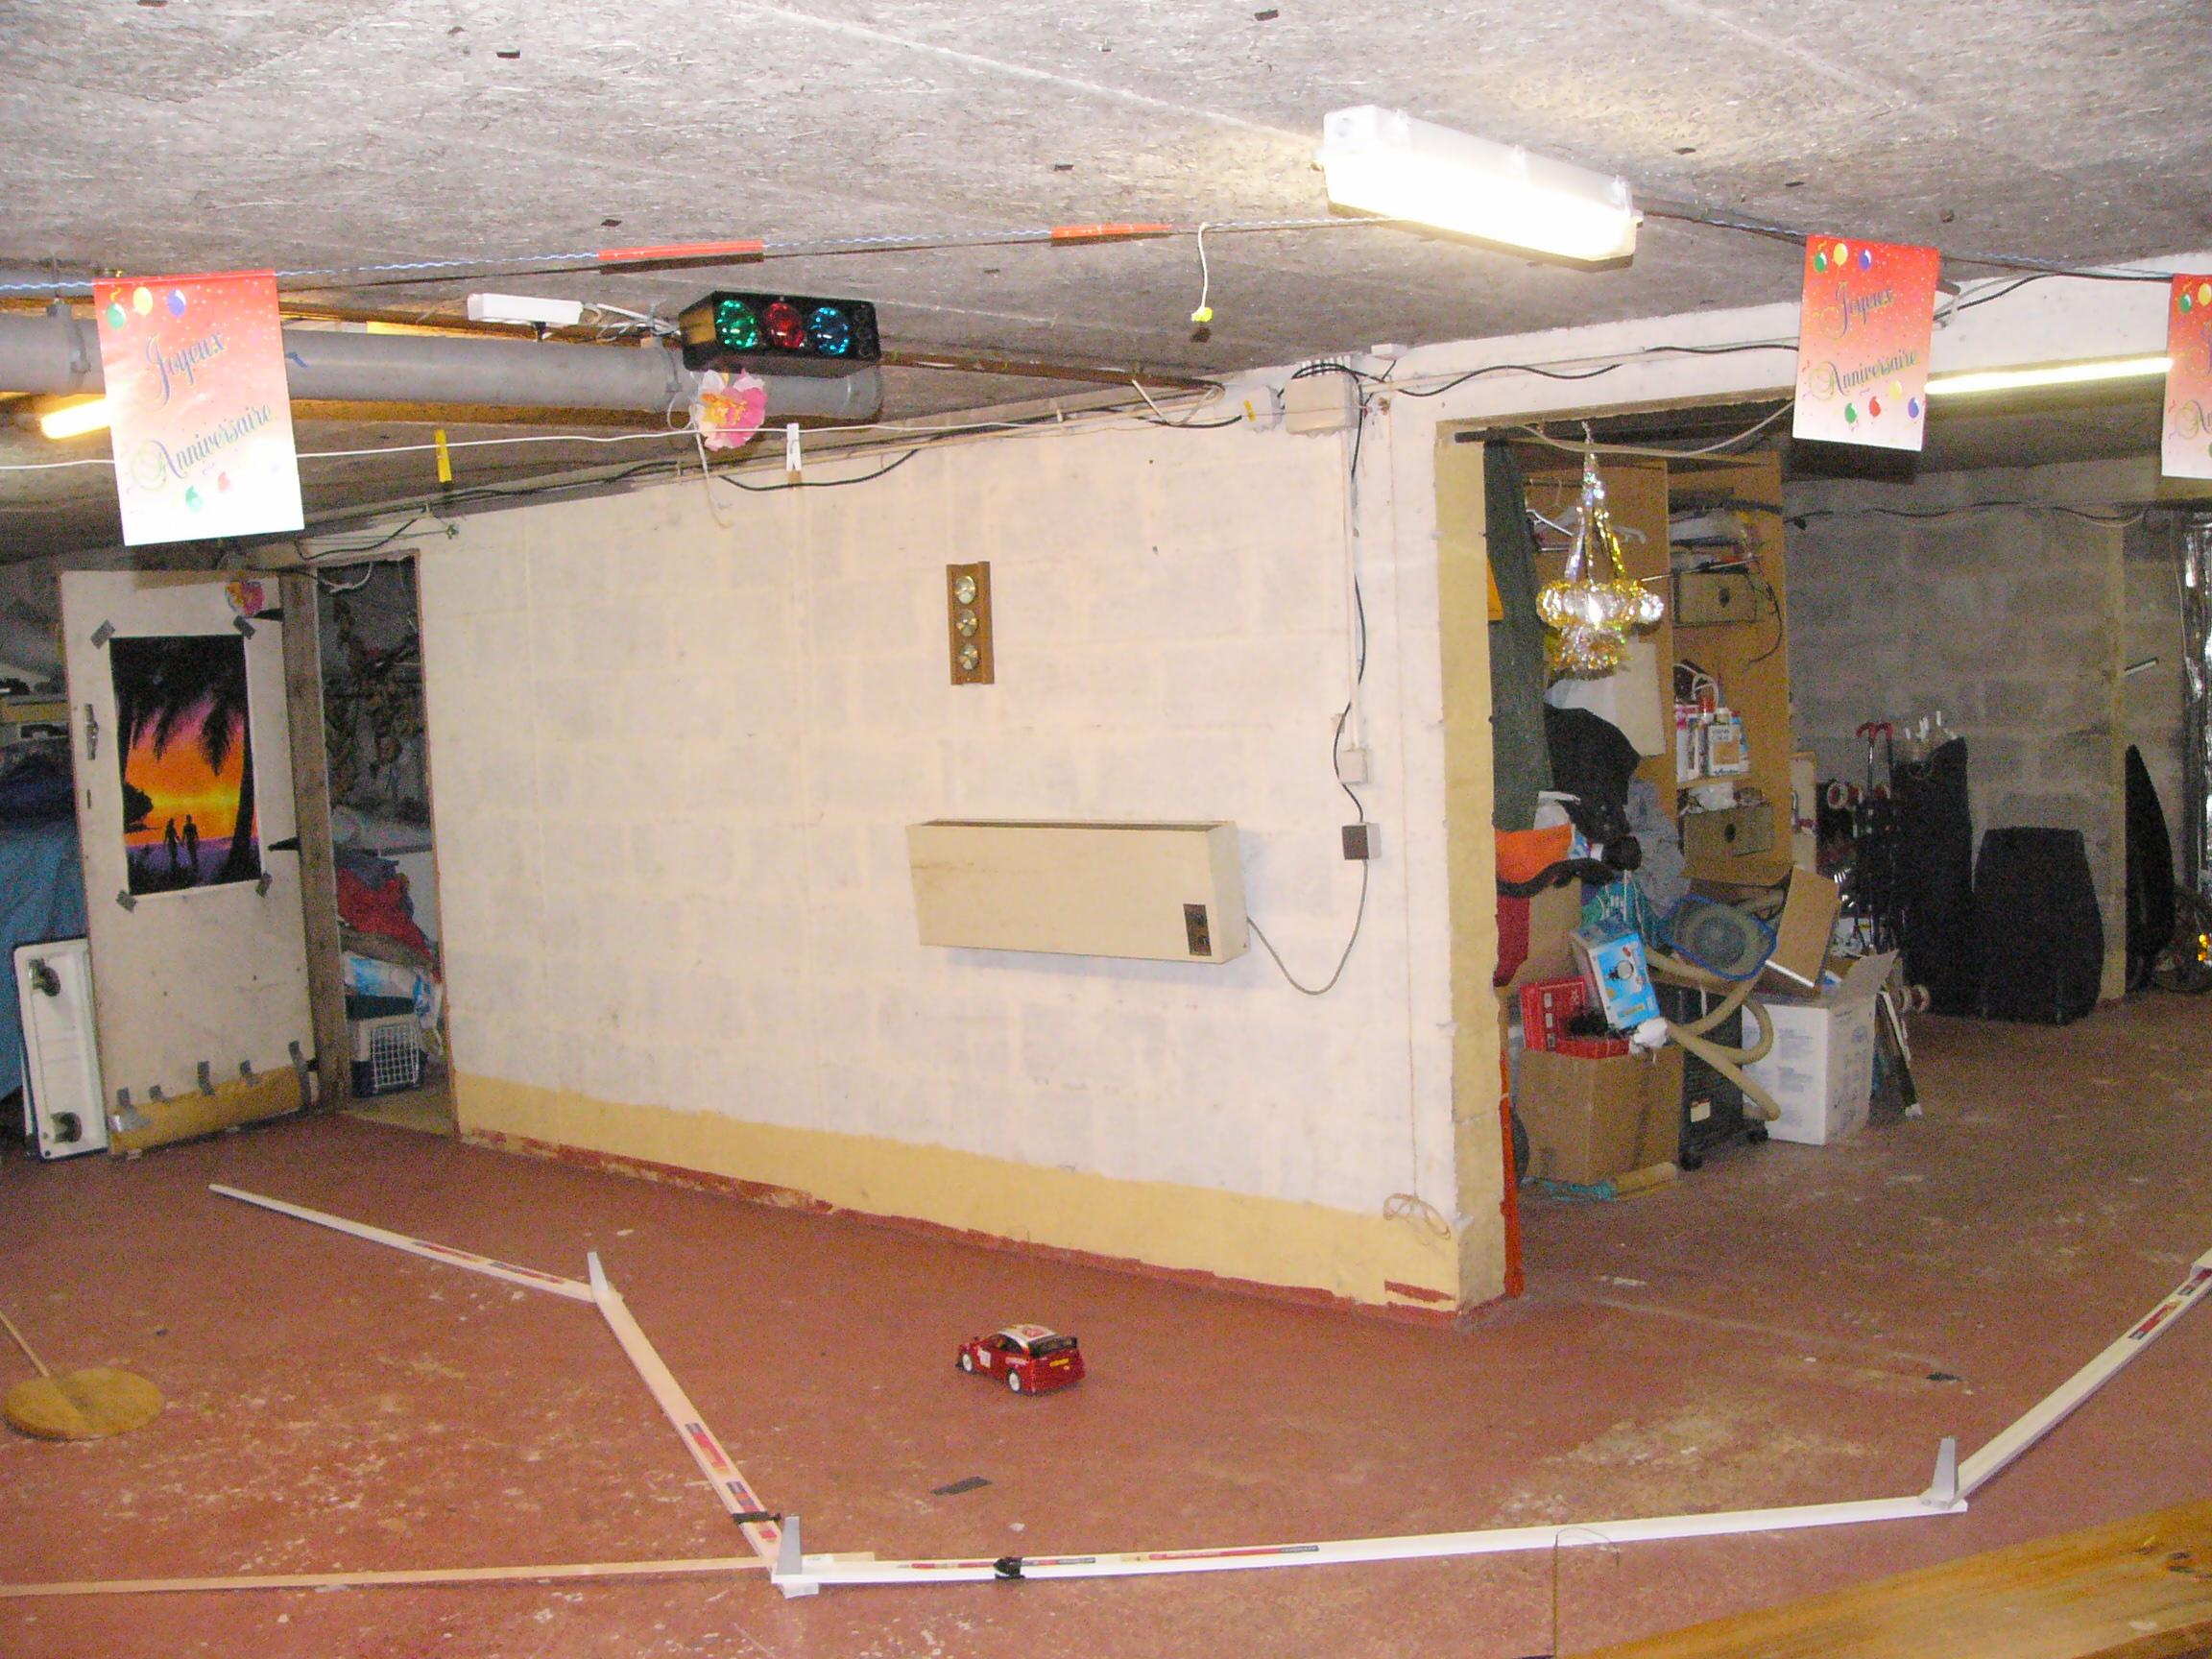 maison � vendre 369k€ � livry gargan